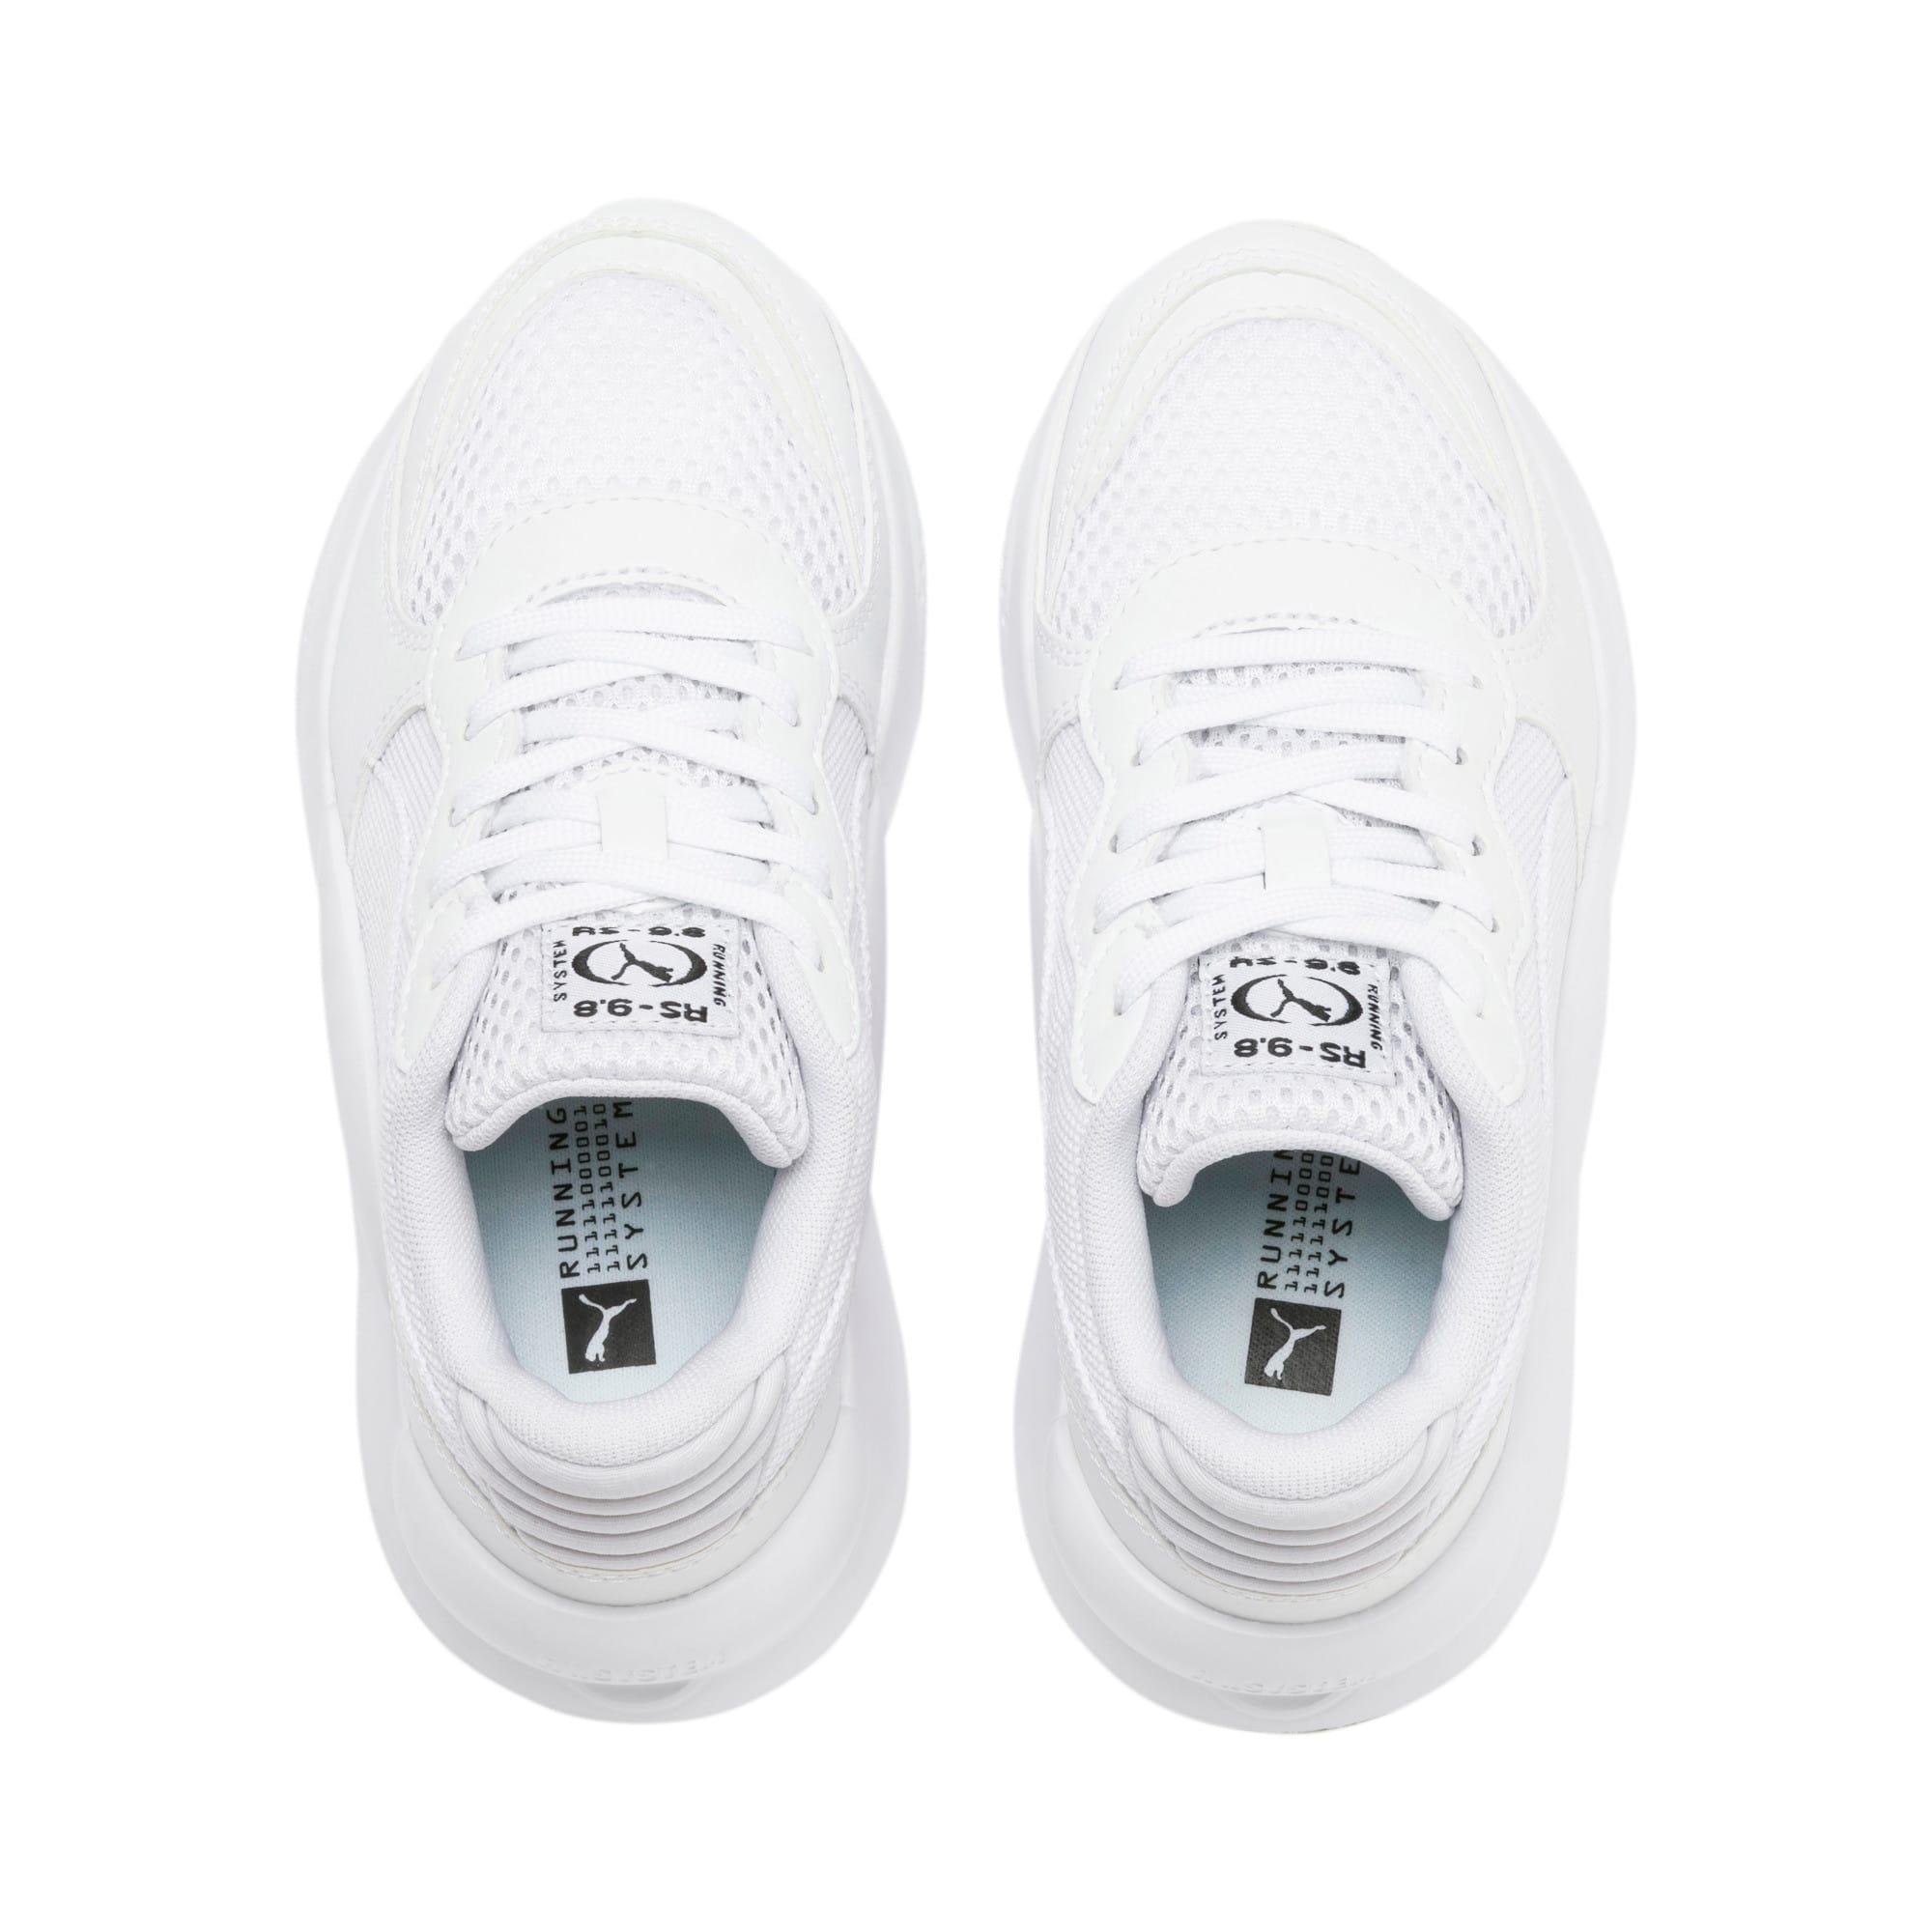 Thumbnail 6 of RS 9.8 Core Little Kids' Shoes, Puma White, medium